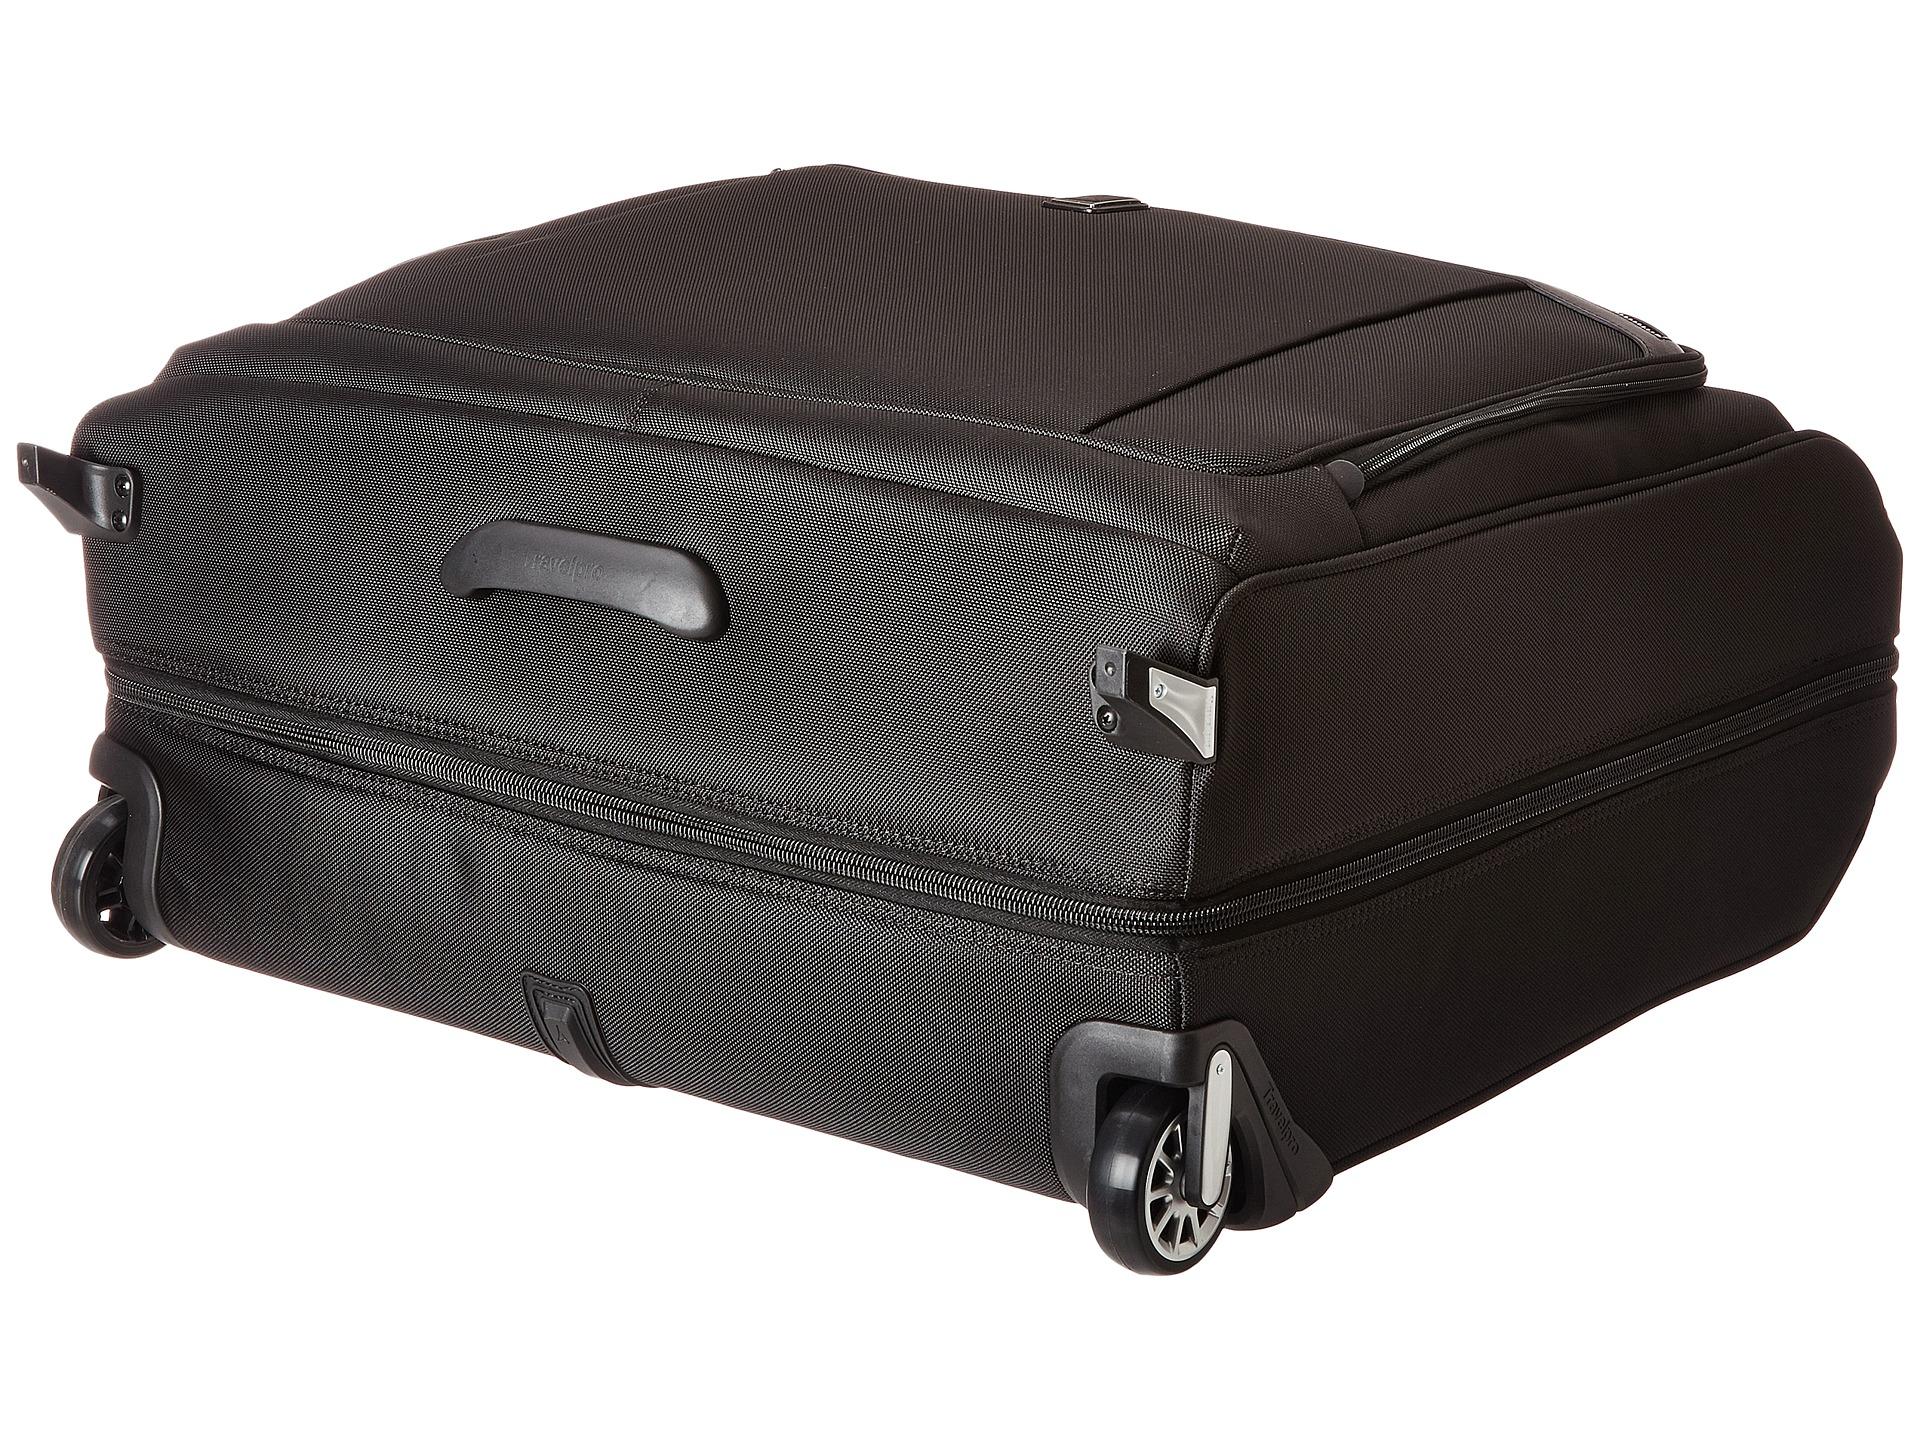 Travelpro Platinum Magna 2 50 Quot Expandable Rolling